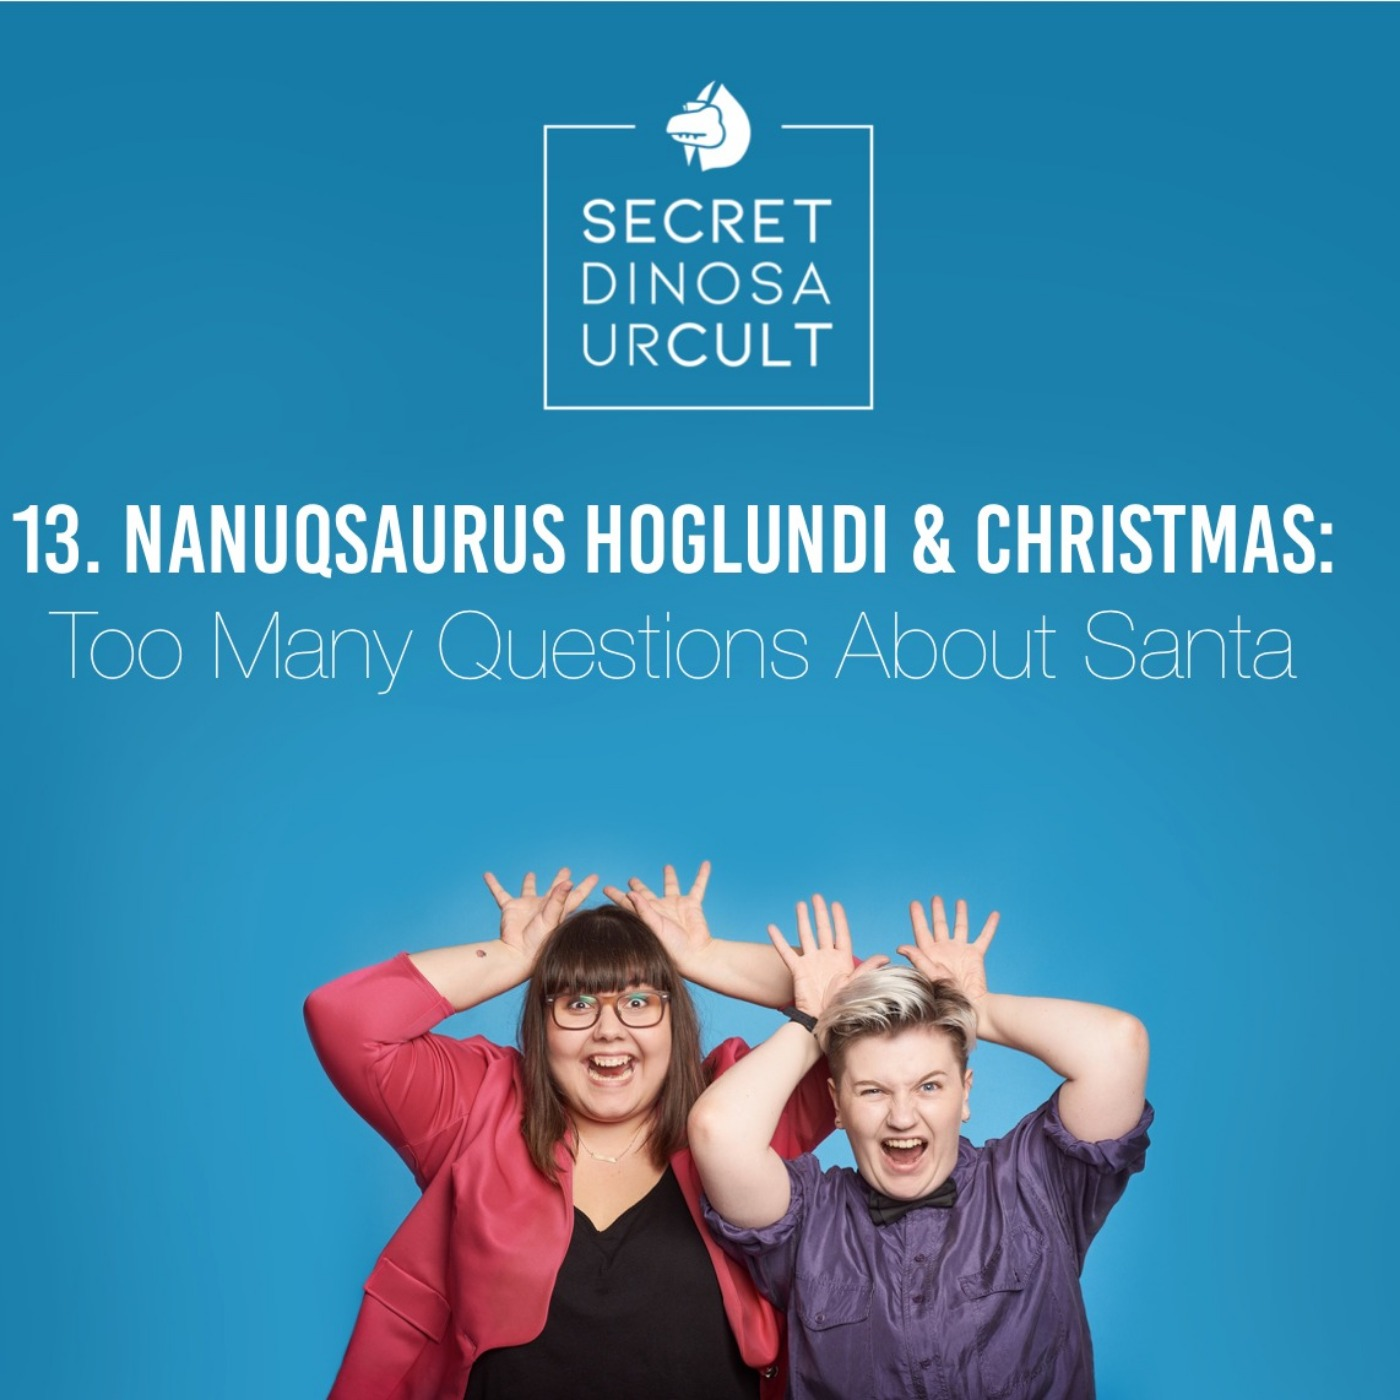 13. Nanuqsaurus Hoglundi & Christmas: Too Many Questions About Santa